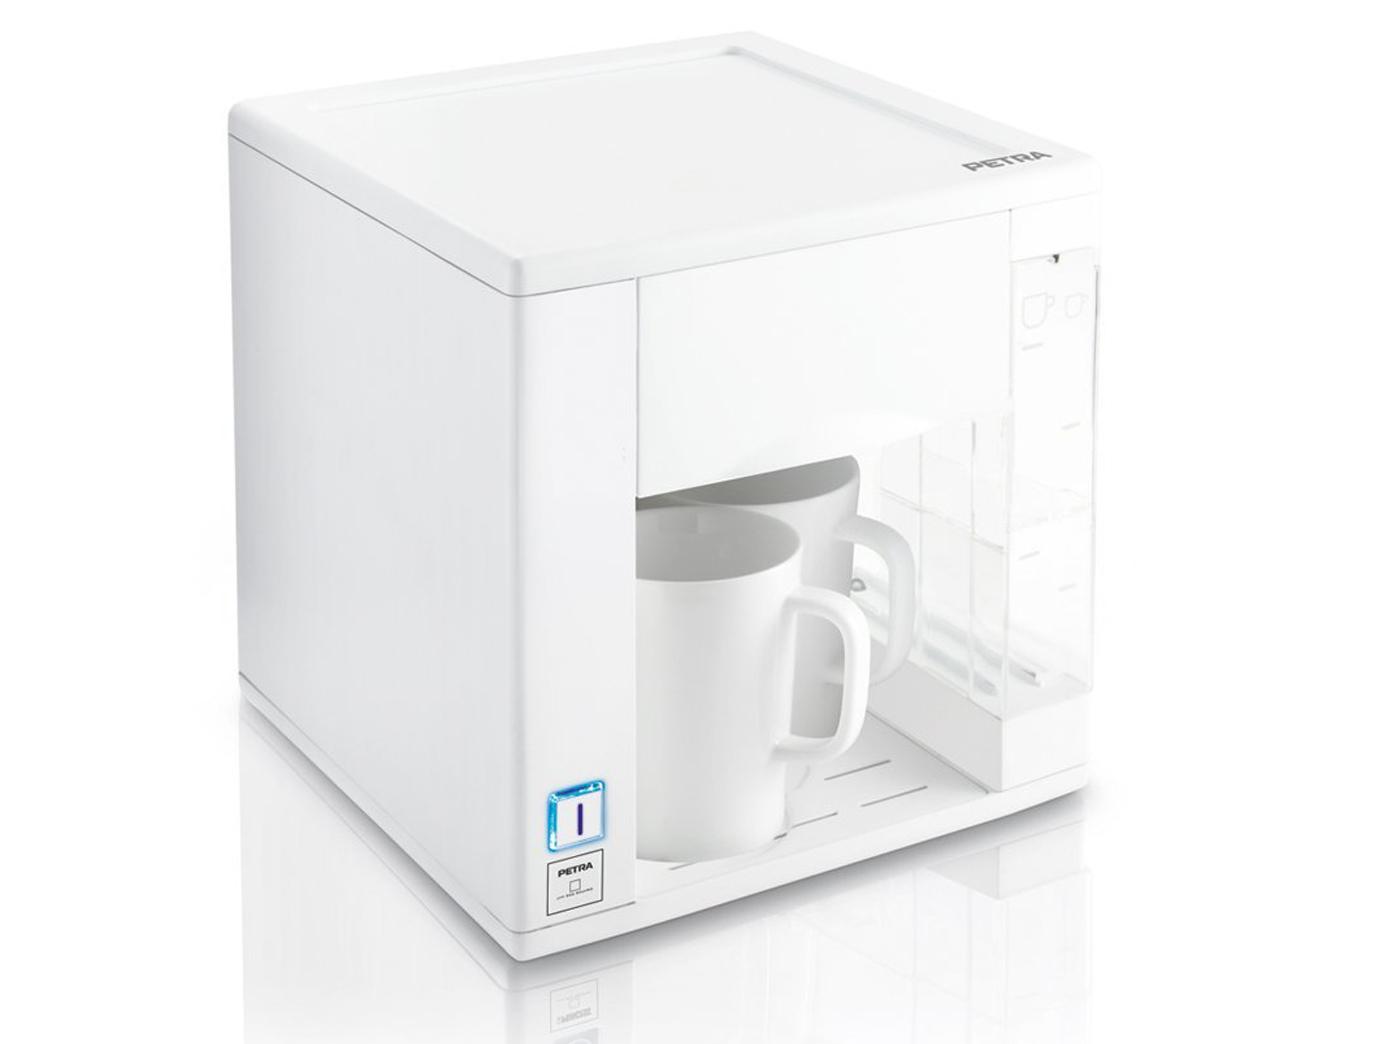 kleine 2 tassen kaffeemaschine singlehaushalt coffee maker mini kaffeekocher ebay. Black Bedroom Furniture Sets. Home Design Ideas